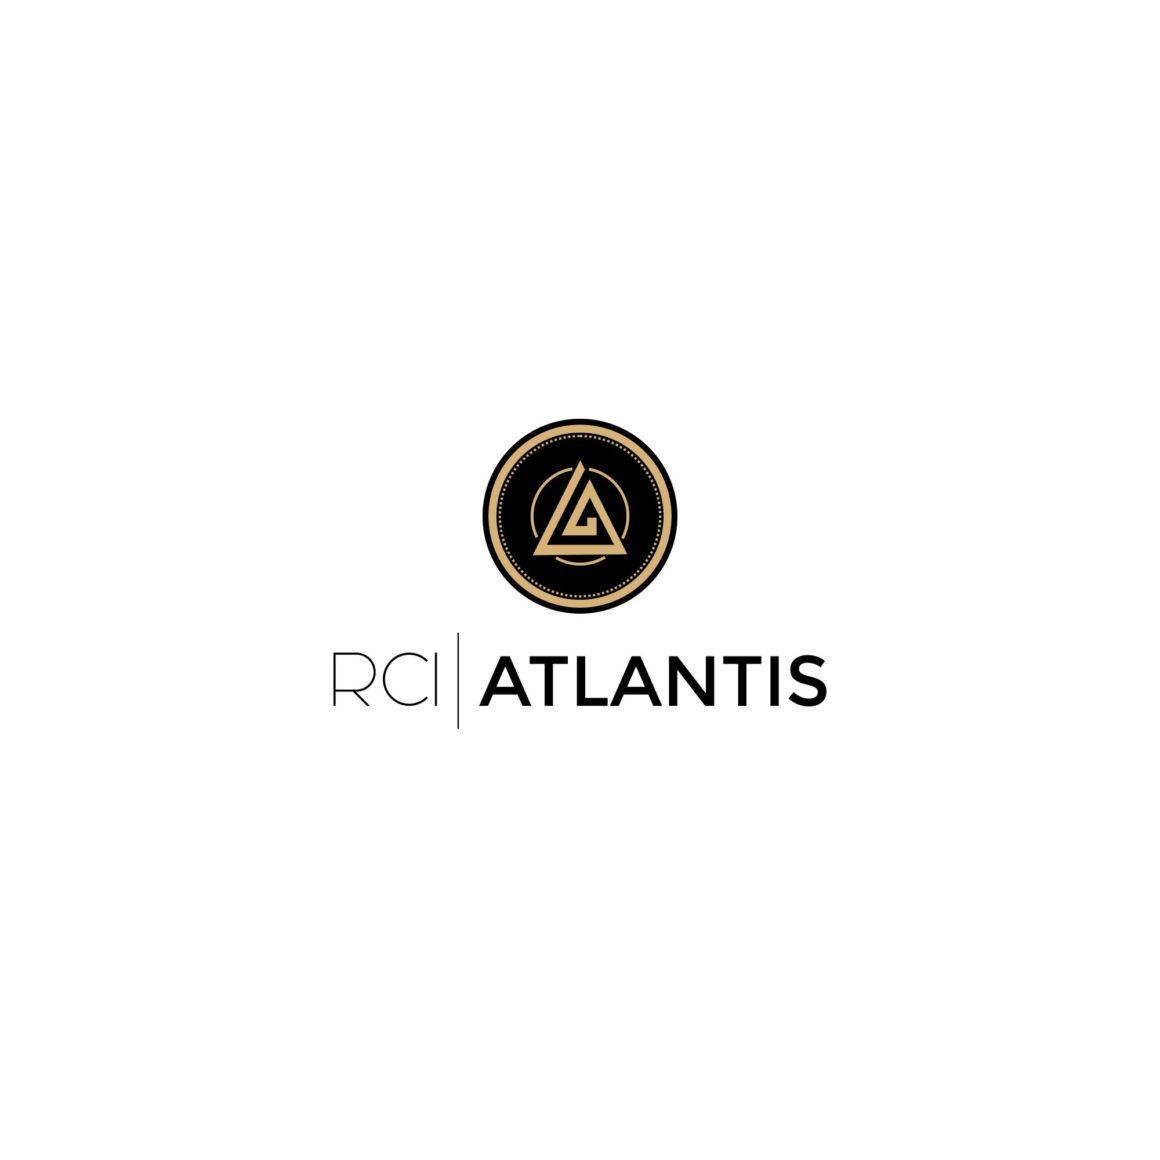 RCI ATLANTIS